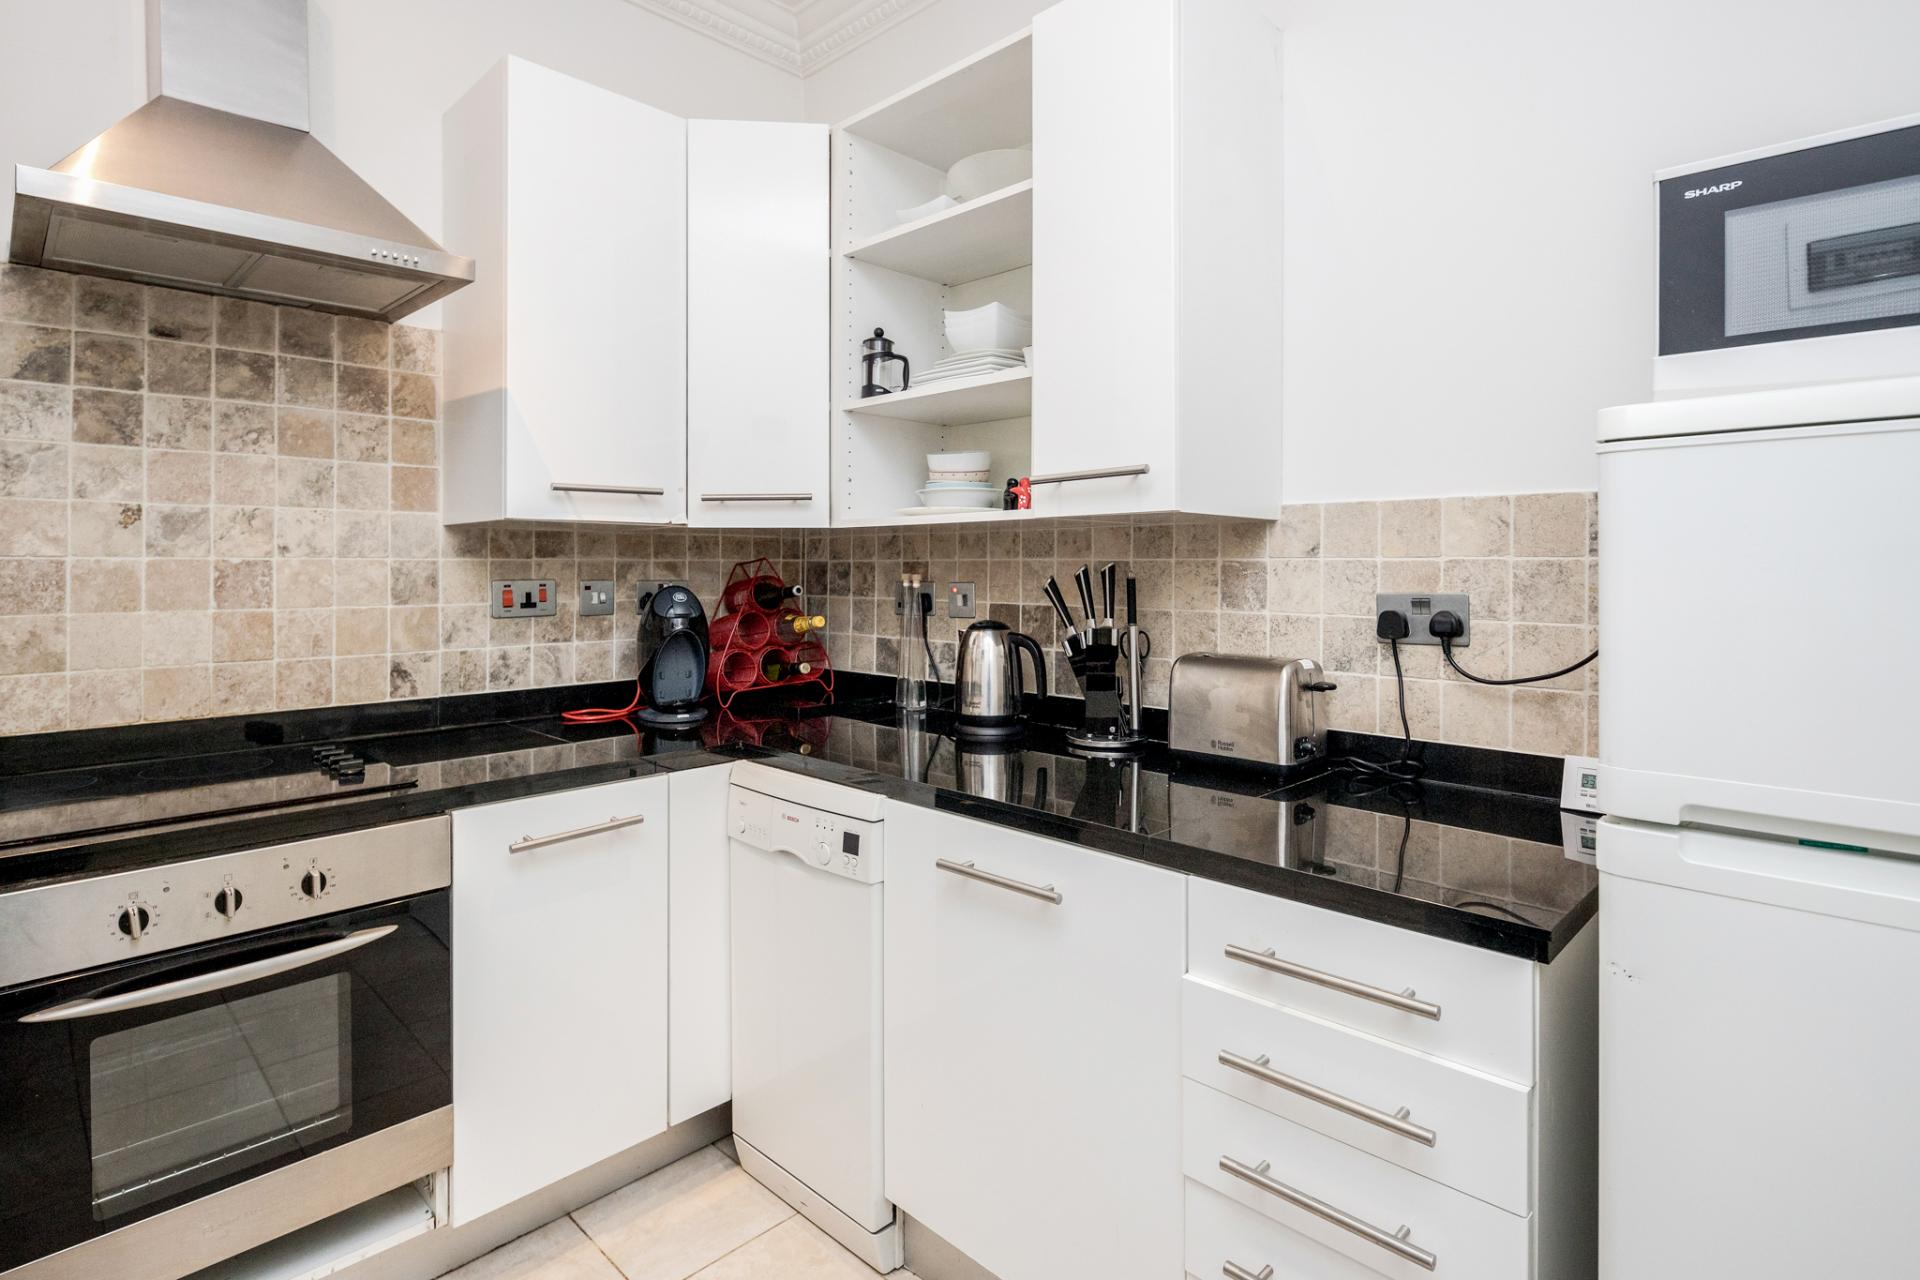 Oven at Kensington High Street, Kensington, London - Citybase Apartments